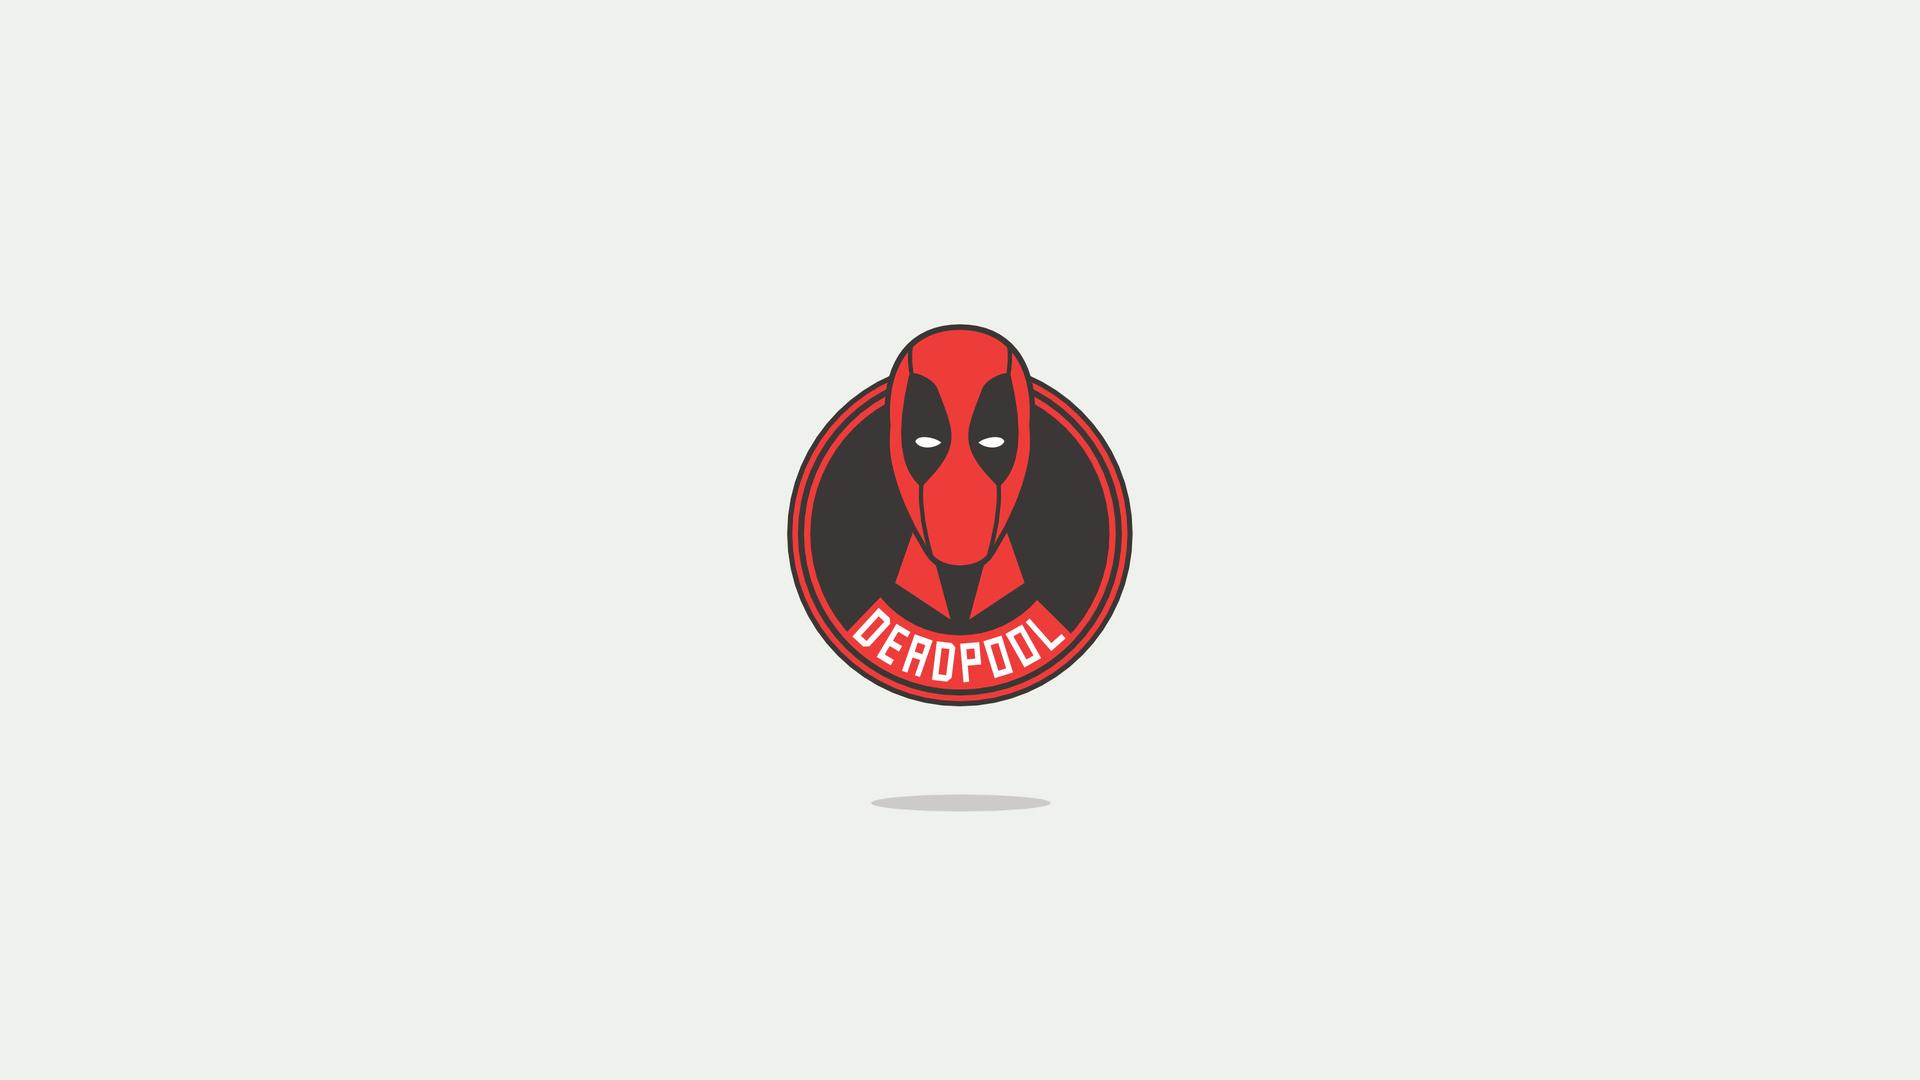 1920x1080 Deadpool America Minimal Logo 4k Laptop Full Hd